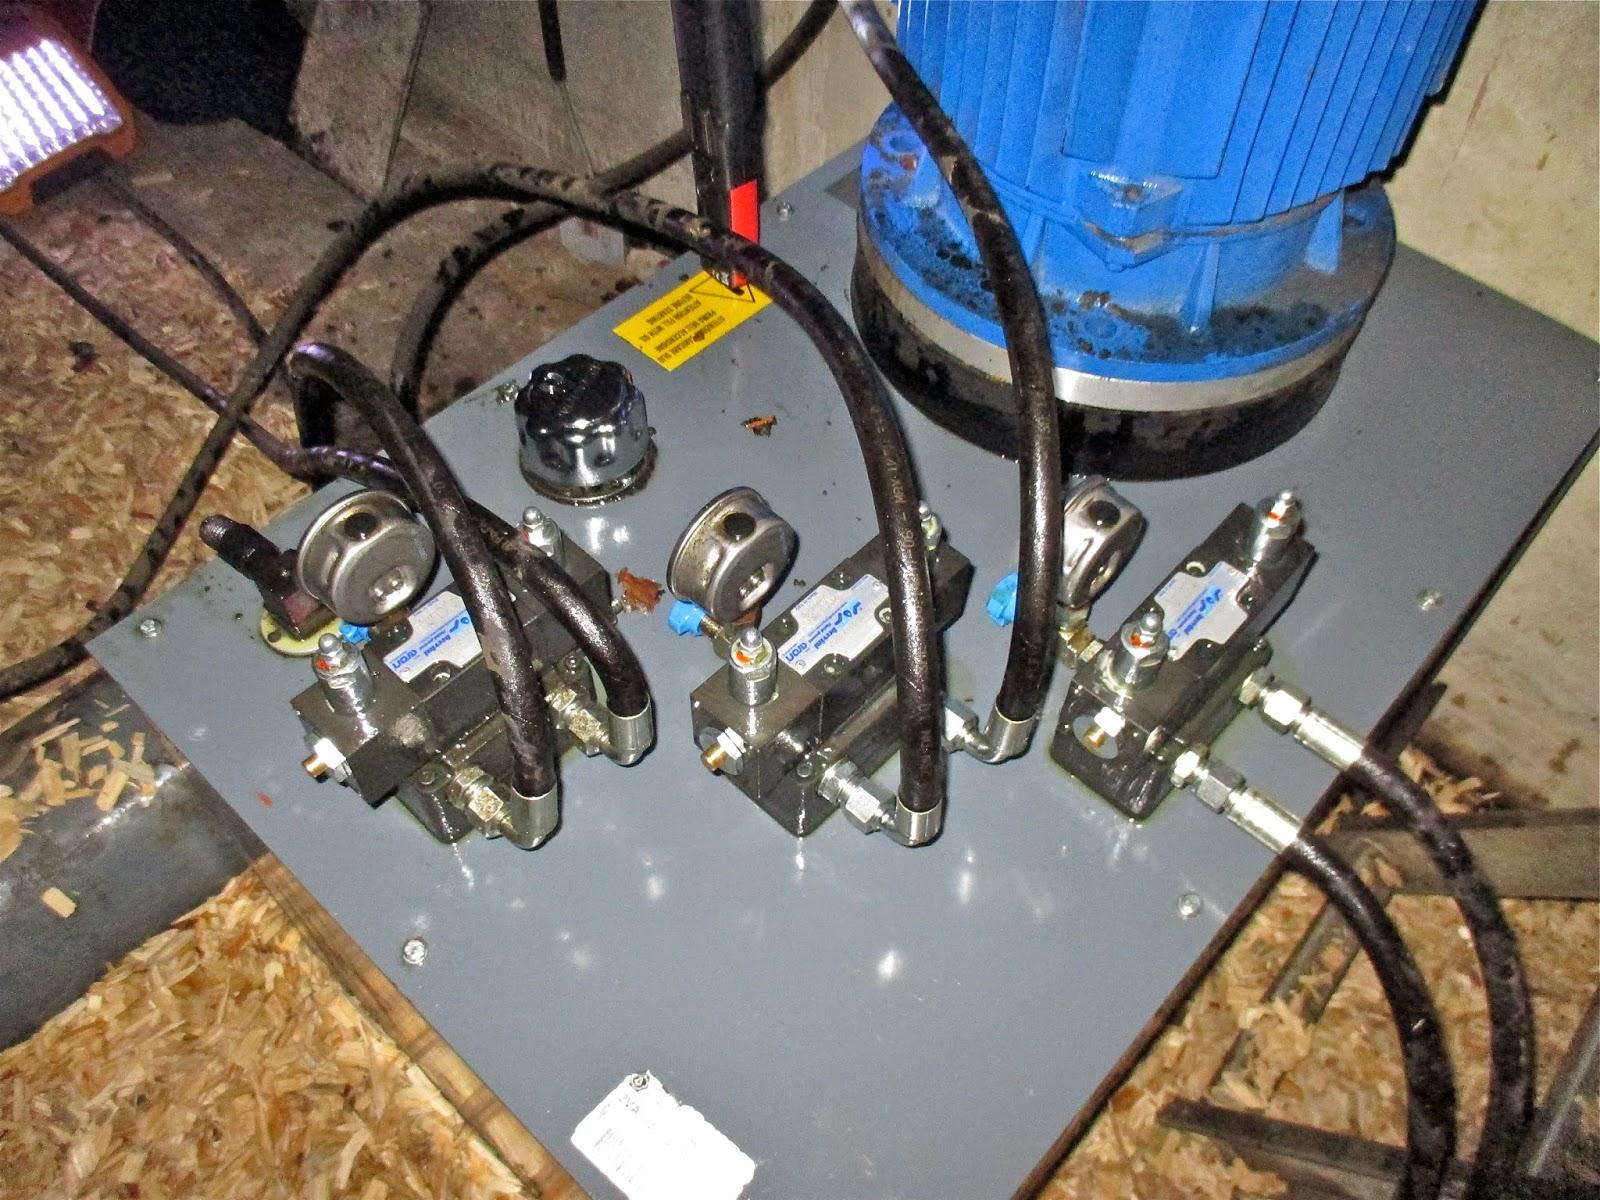 Biomass hydraulic power unit inspection - site visit